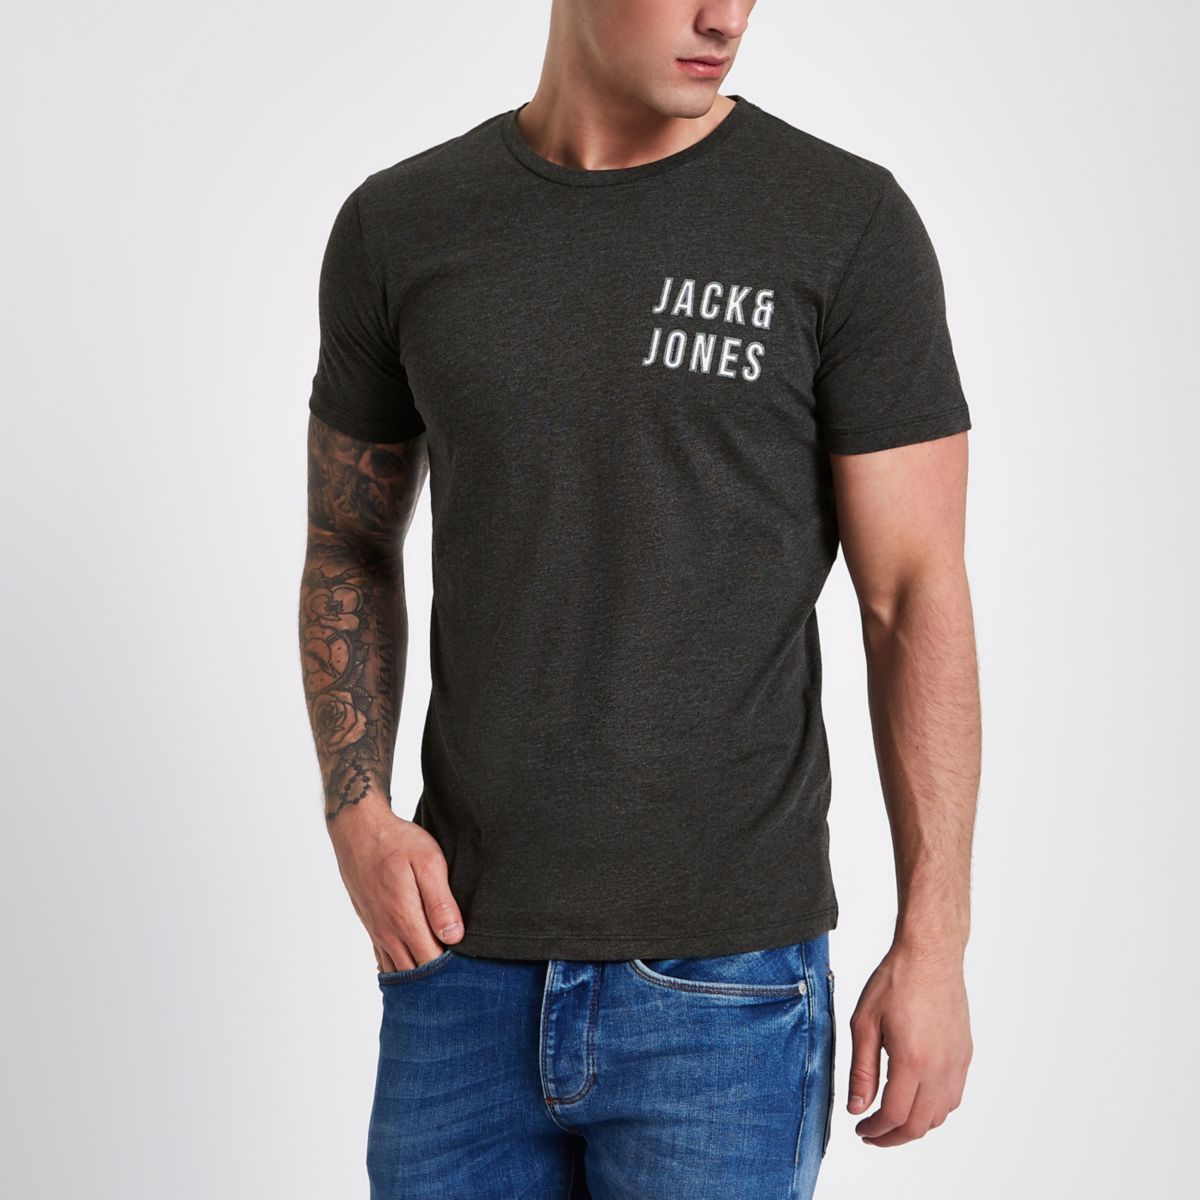 Jack & Jones Core navy printed T-shirt